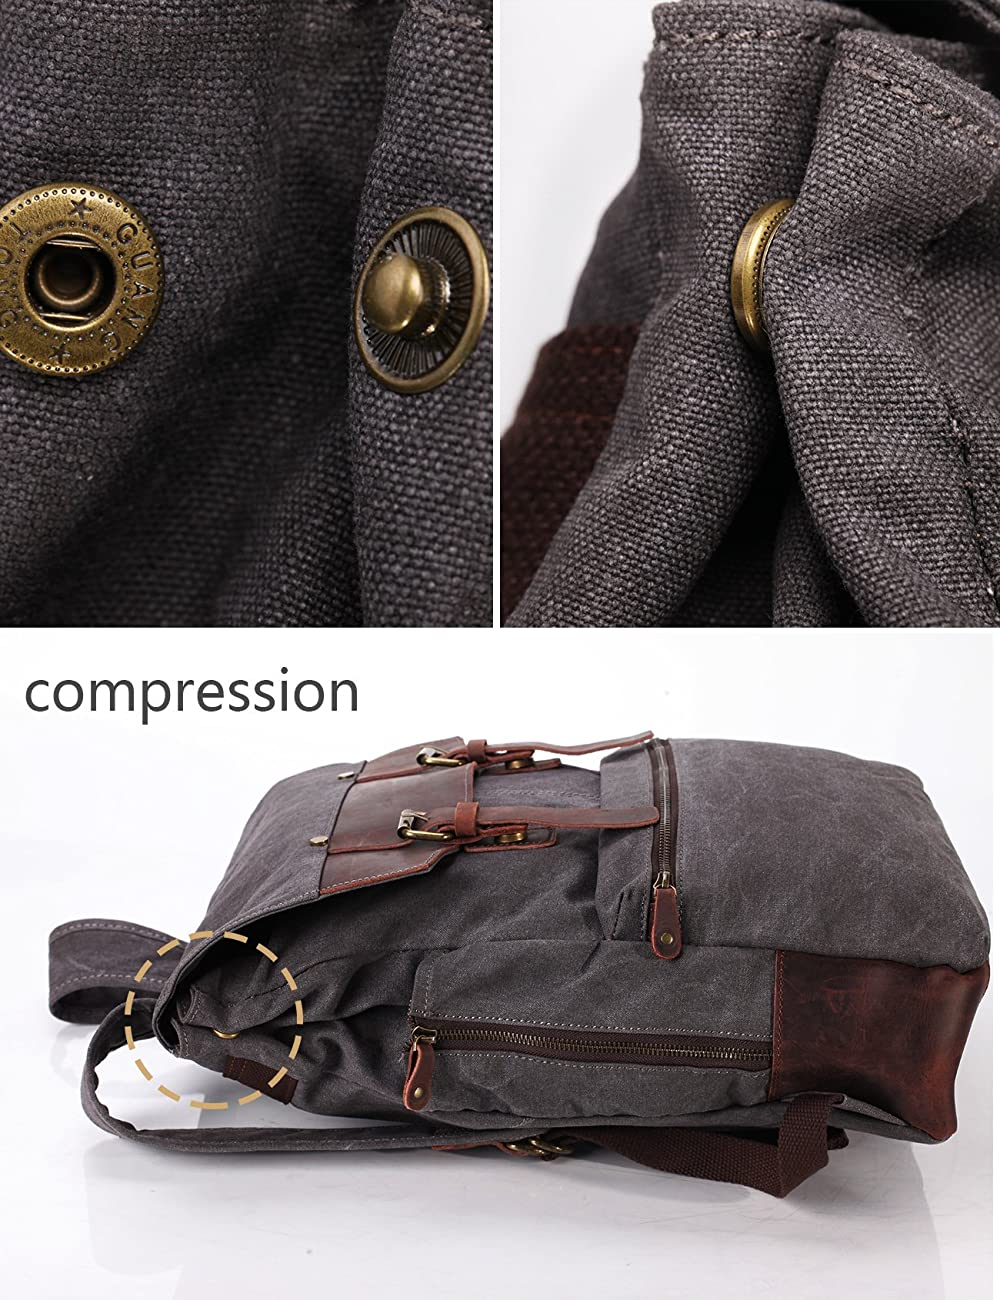 ZEKAR Vintage Waxed Canvas Leather Backpack, Multipurpose Daypacks 4